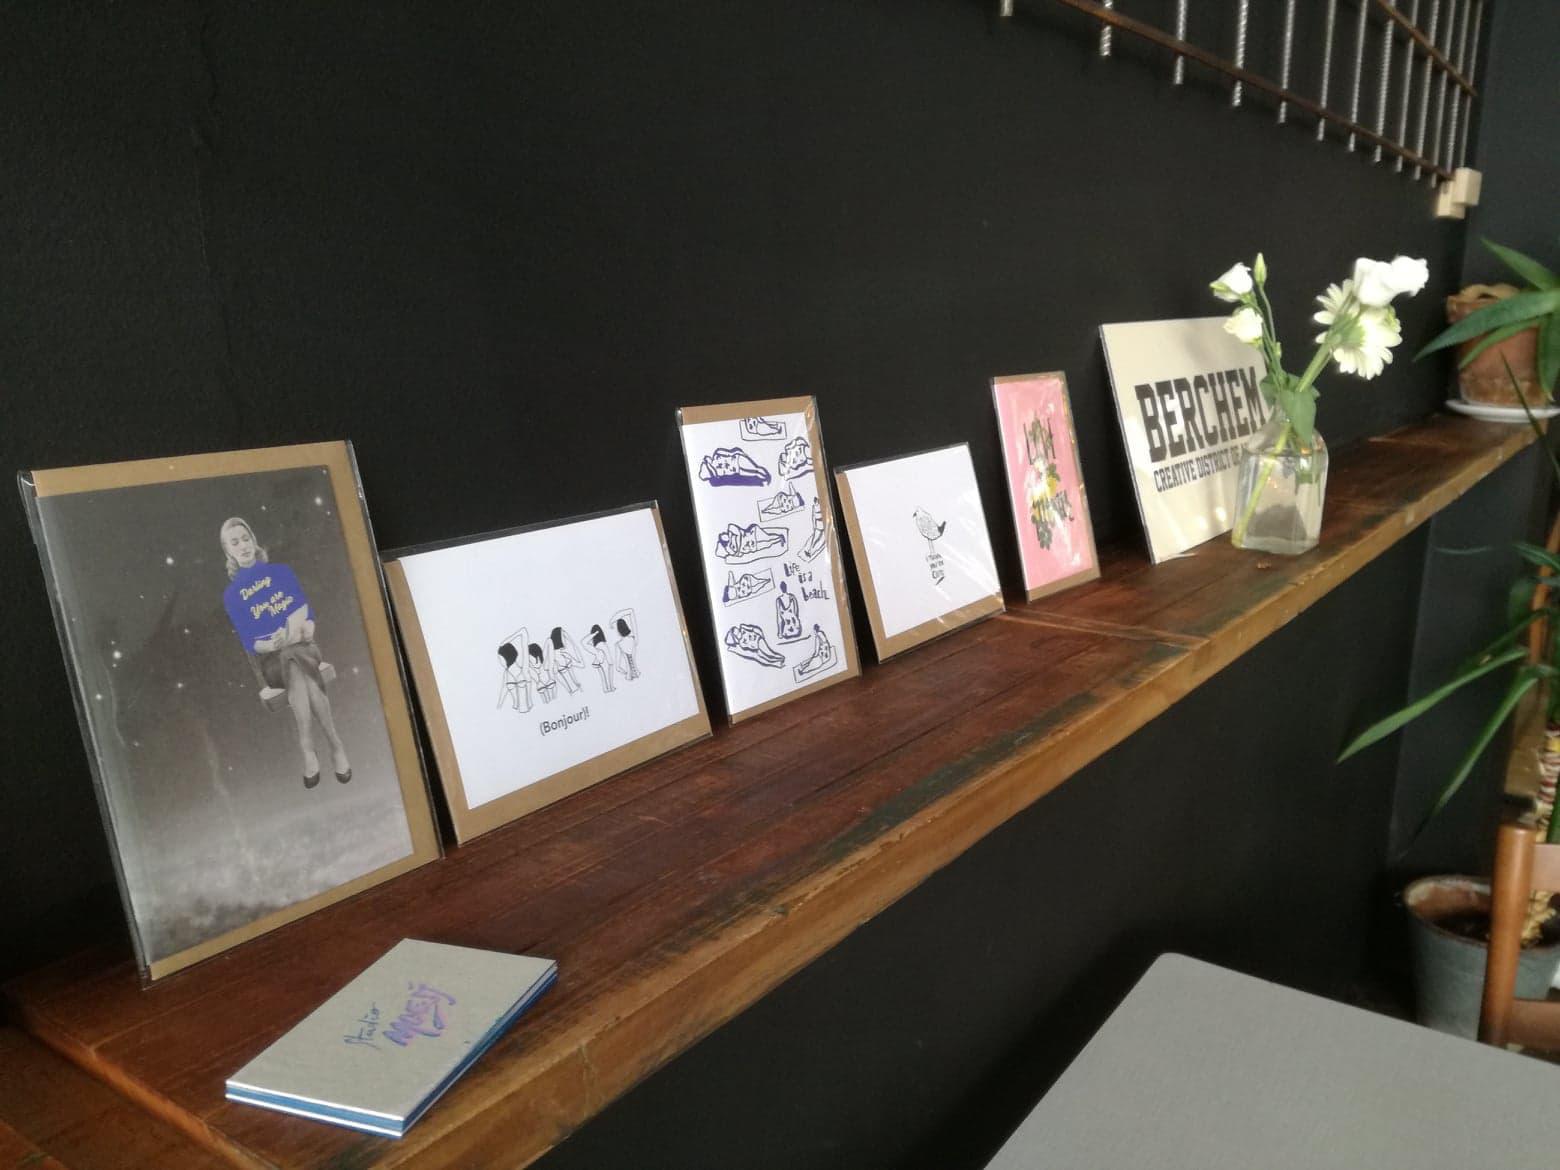 Studio Moesj kaartjes naast elkaar